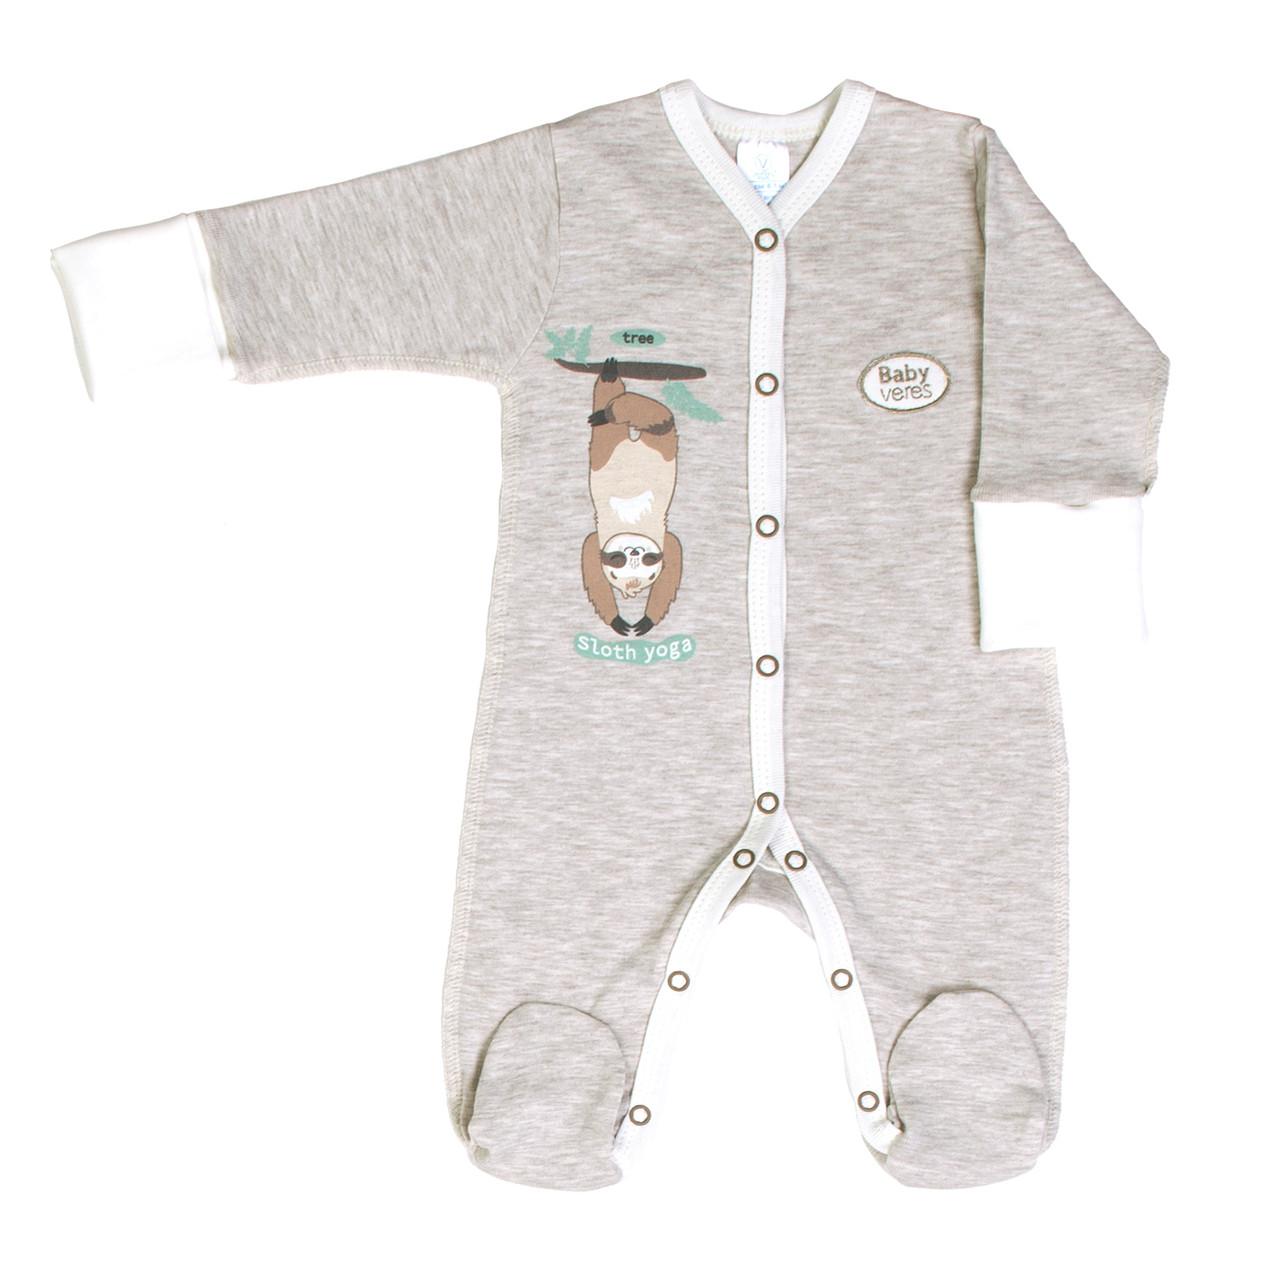 Комбинезон Baby Veres Sloth yoga молочный рибана